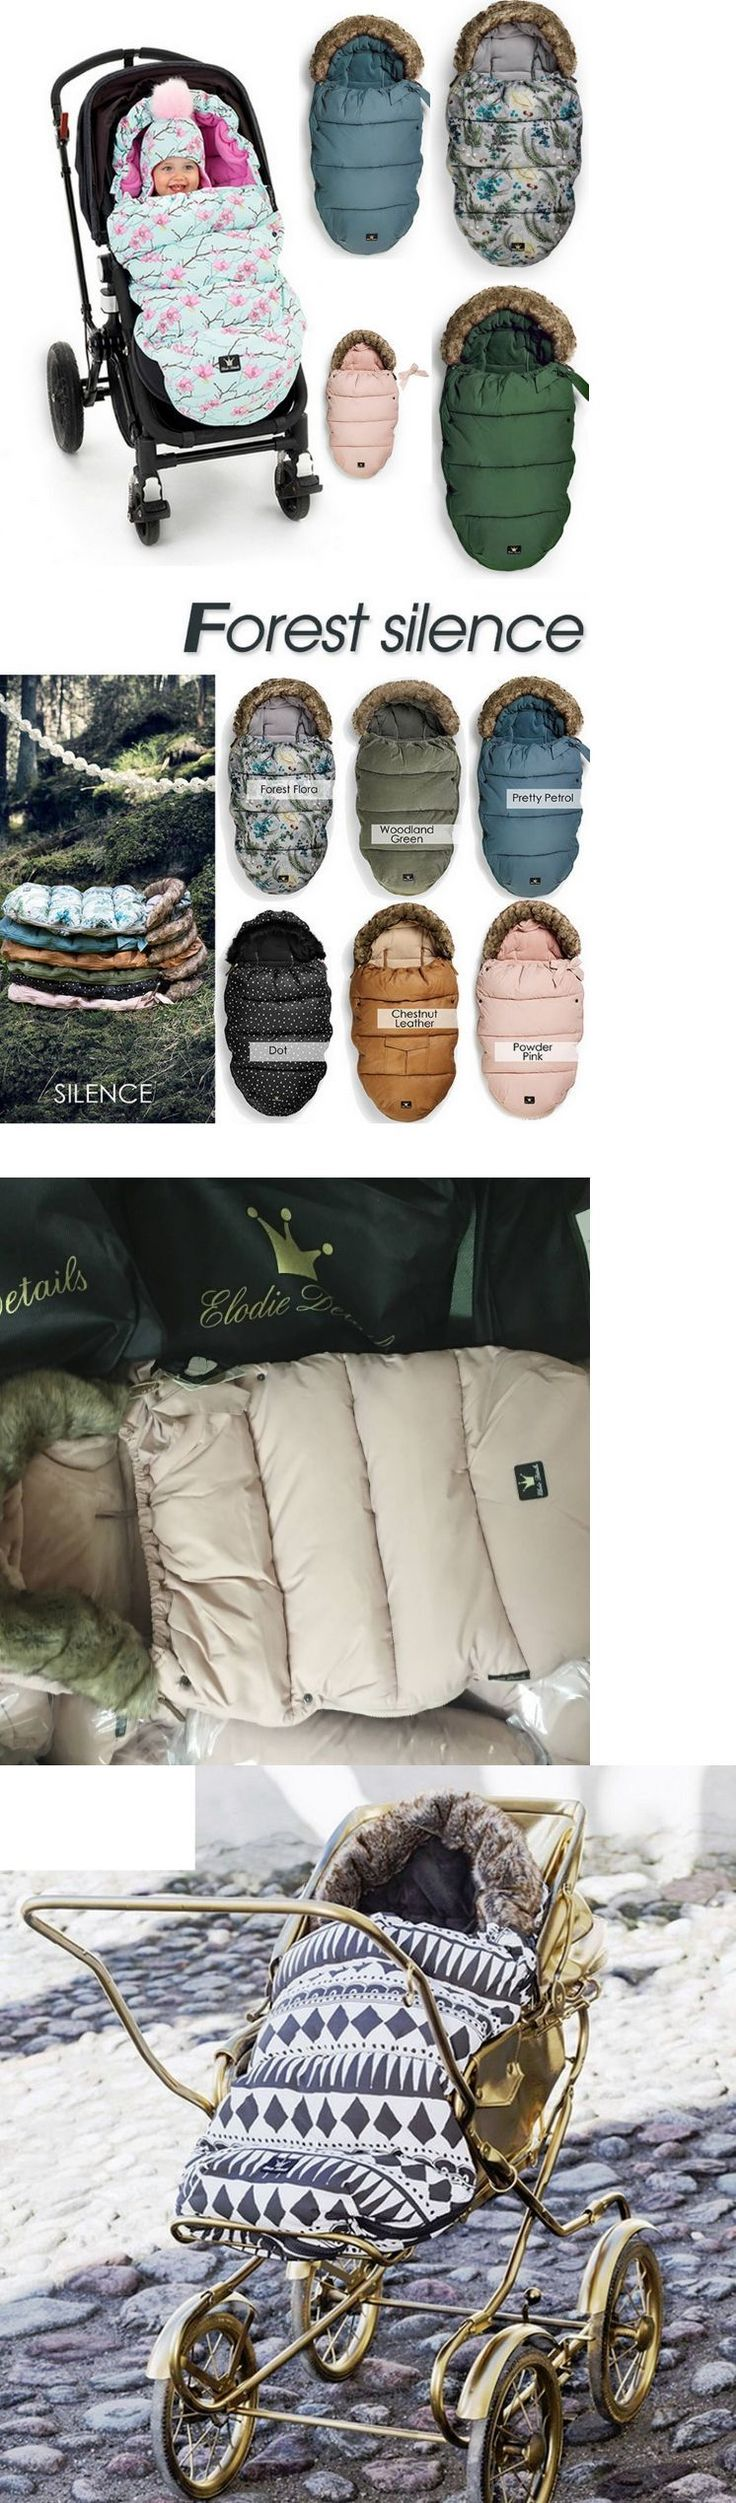 Footmuffs 116553: Elodie Details Baby Stroller Sleeping Bag Footmuff Warm Thickened Sleepsacks -> BUY IT NOW ONLY: $91.53 on eBay! #babysleepsack